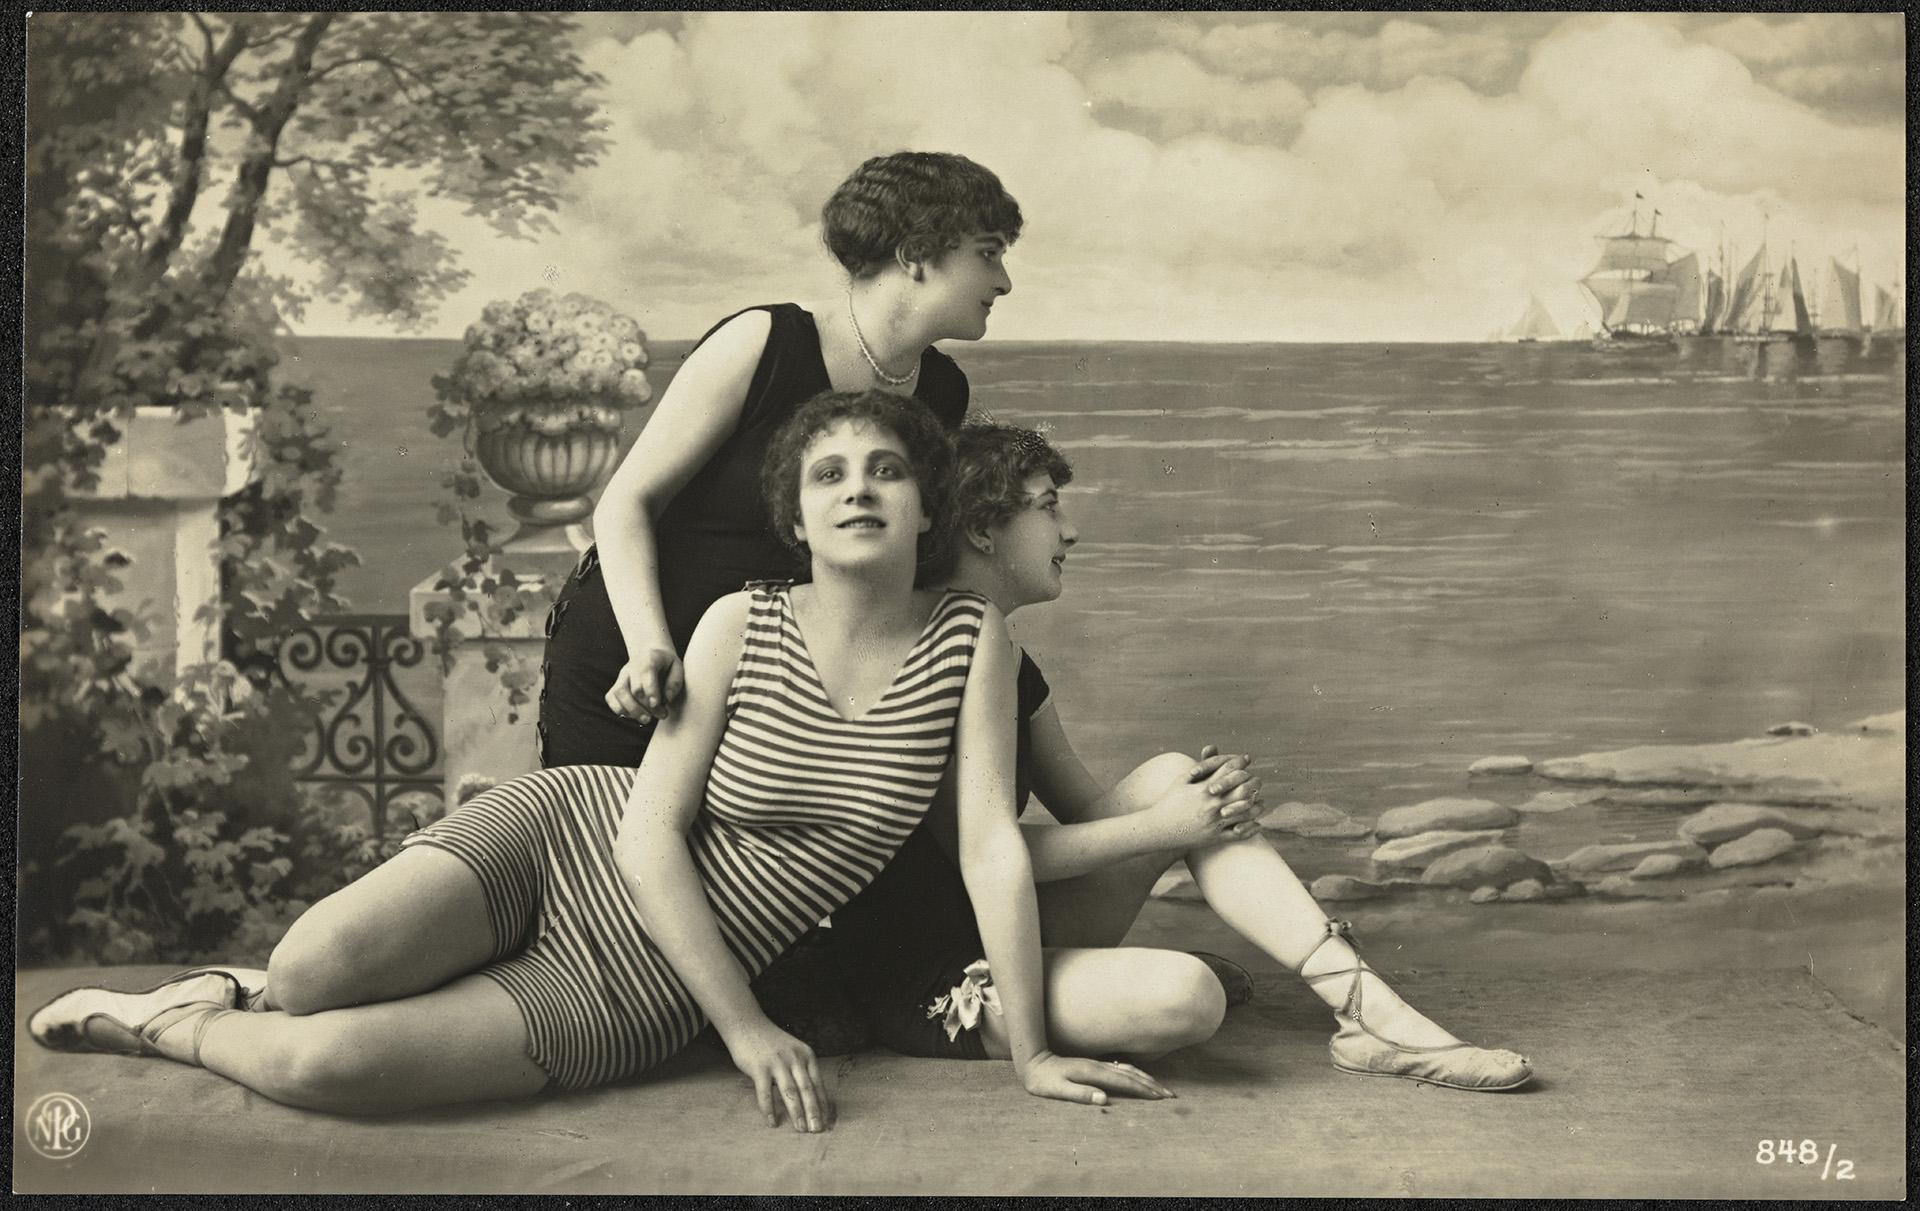 utgiver: Neue Photographische Gesellschaft (NPG), ca. 1920, fotograf: ukjent